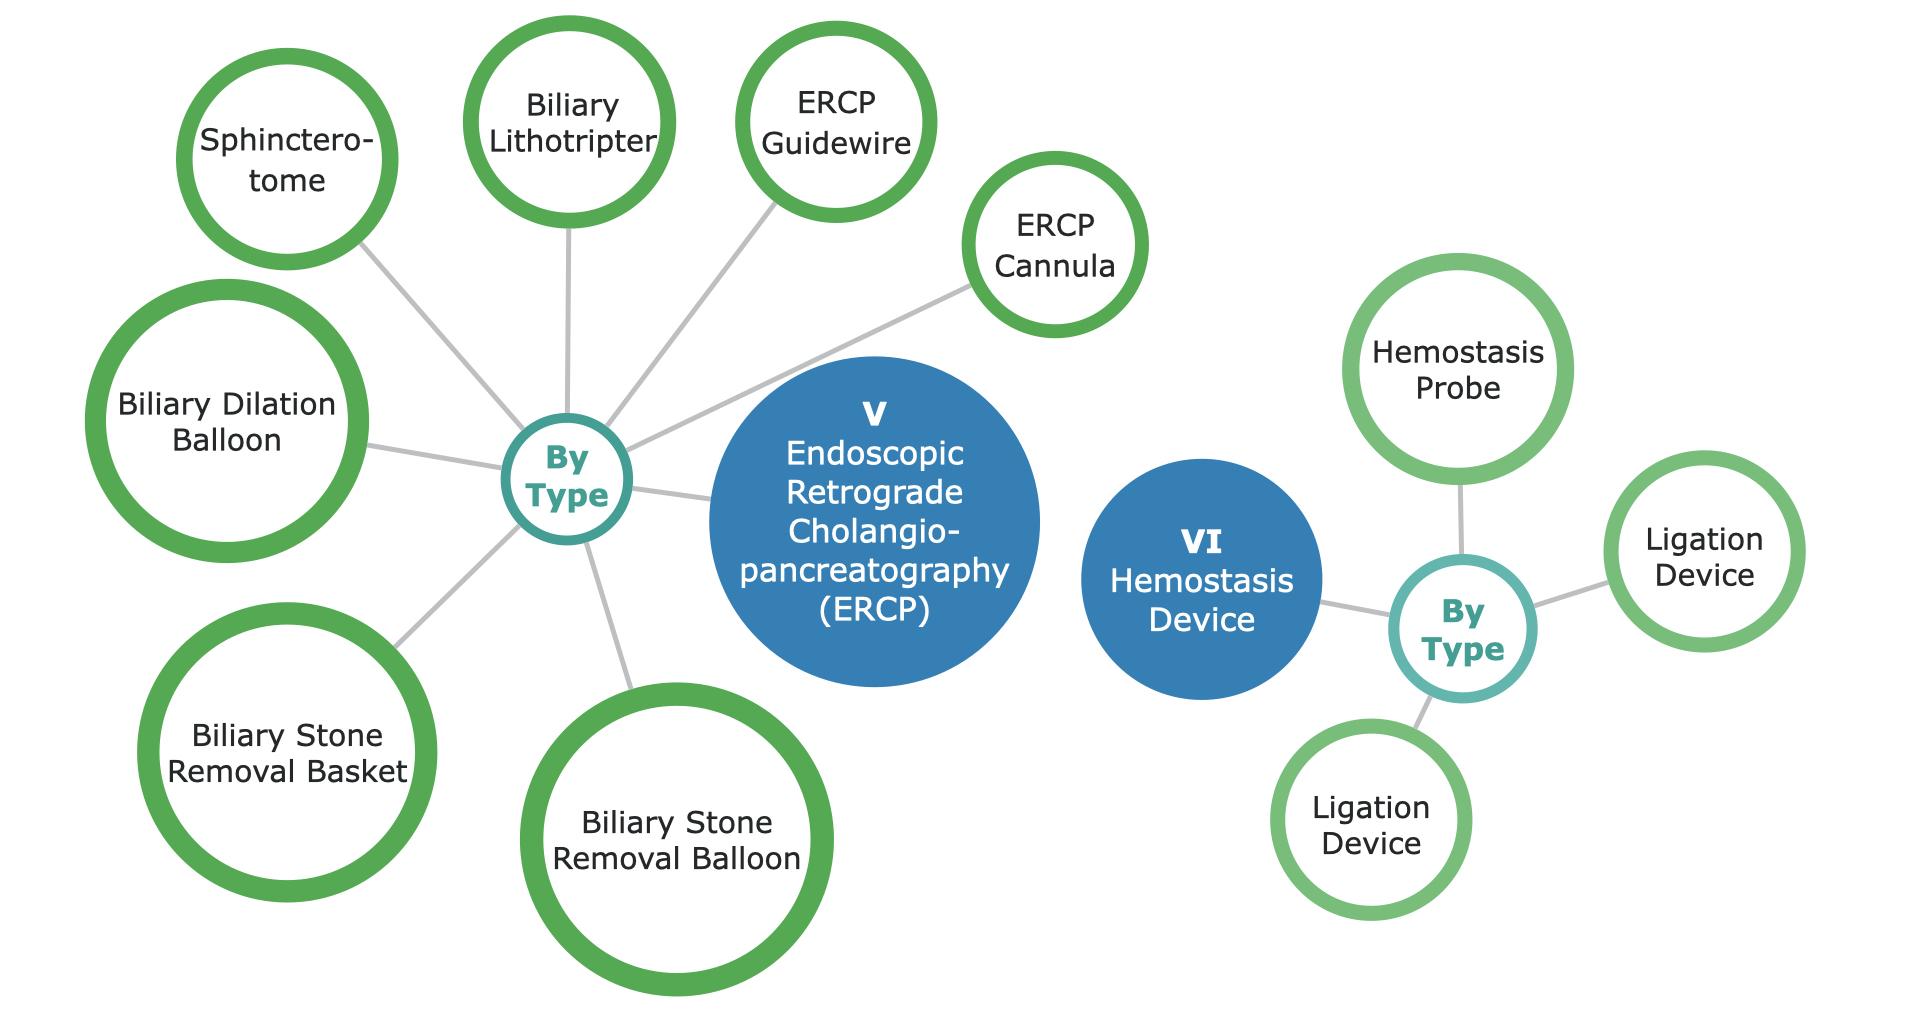 Chinese Gastrointestinal Endoscopy Device Market Segmentation - p2